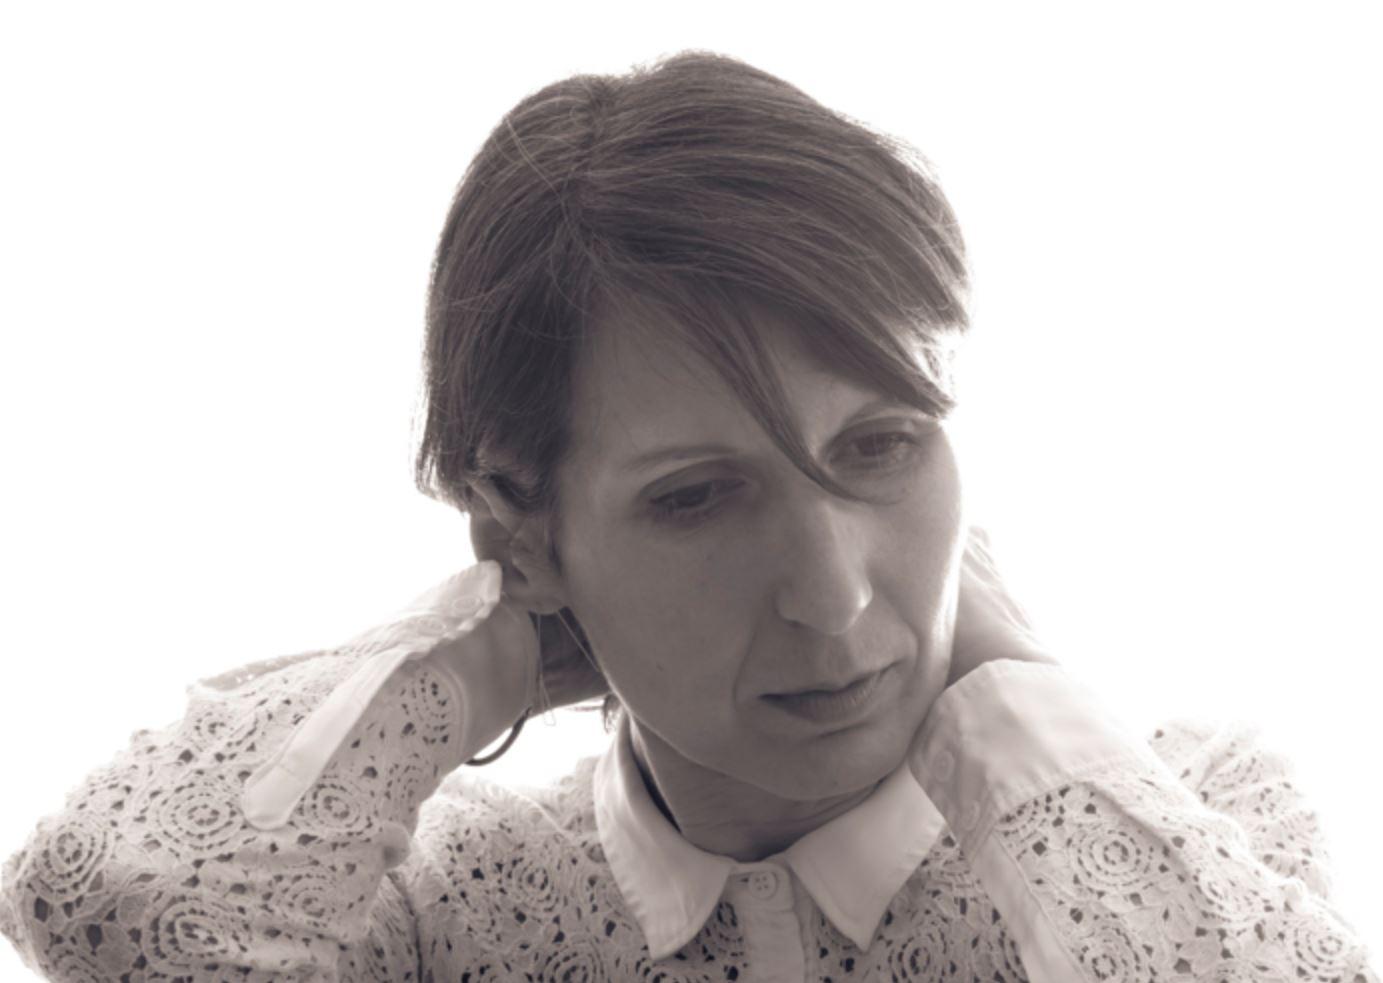 Composer Ana Sokolović